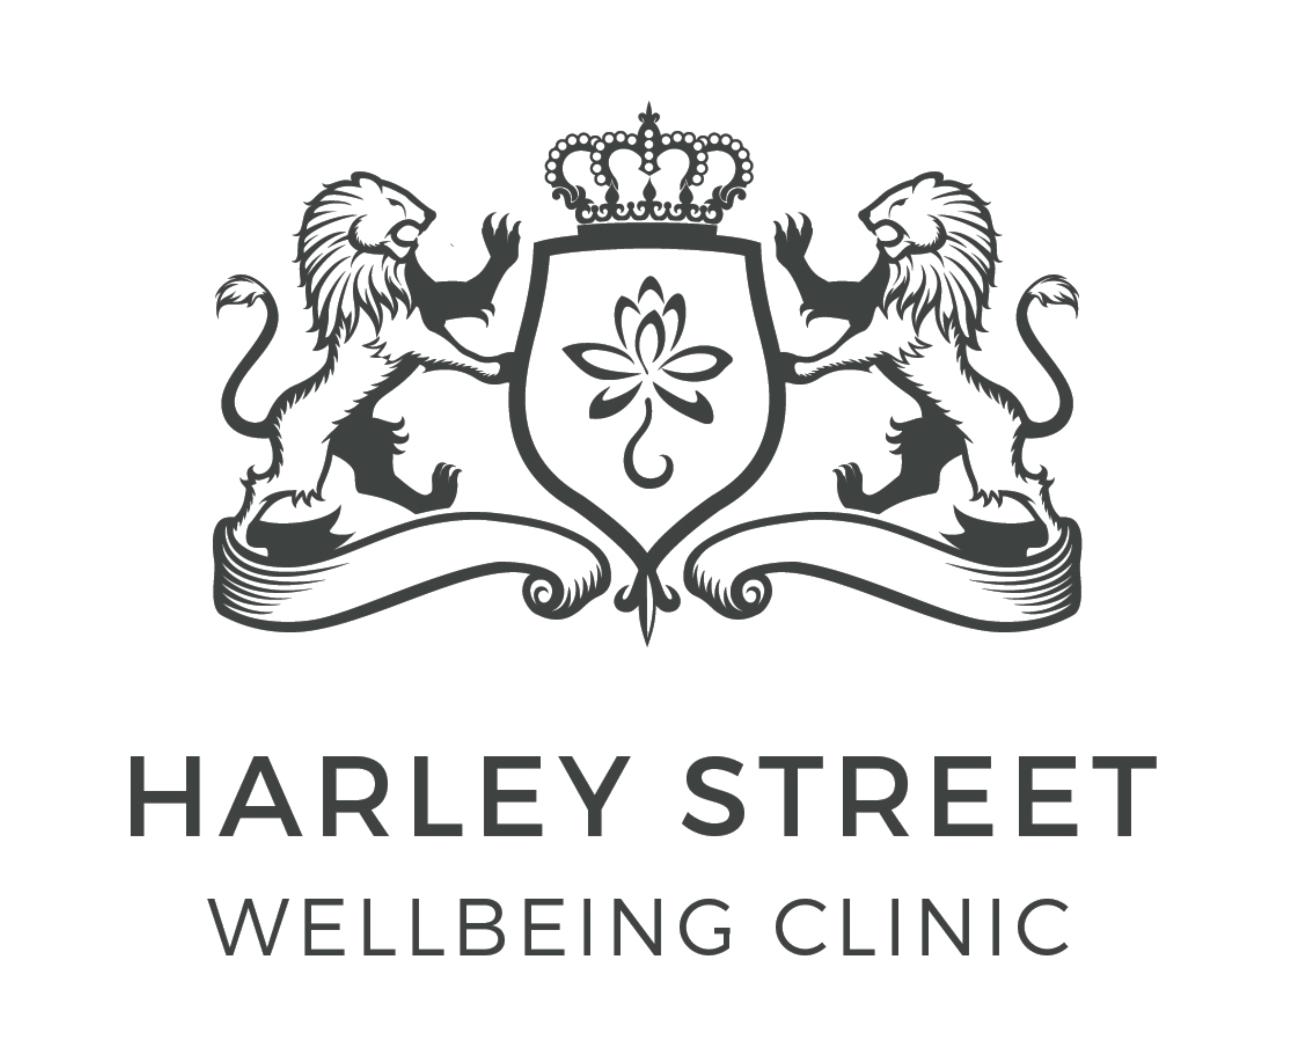 Harley street wellbeing clinic